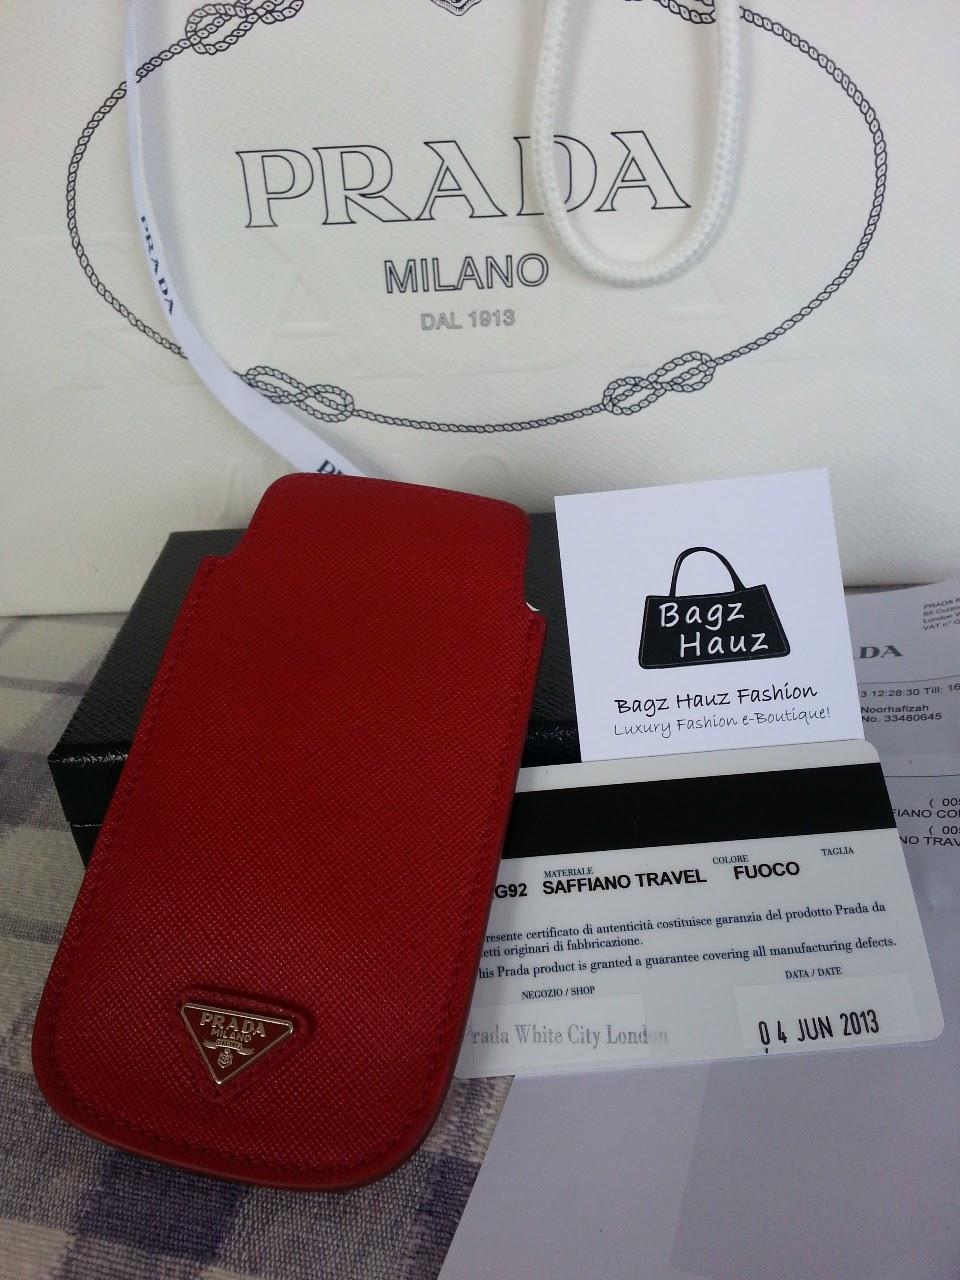 f4f7c3c1a8fb PRADA iPhone 5 Saffiano Leather Case ~ For Affy ~